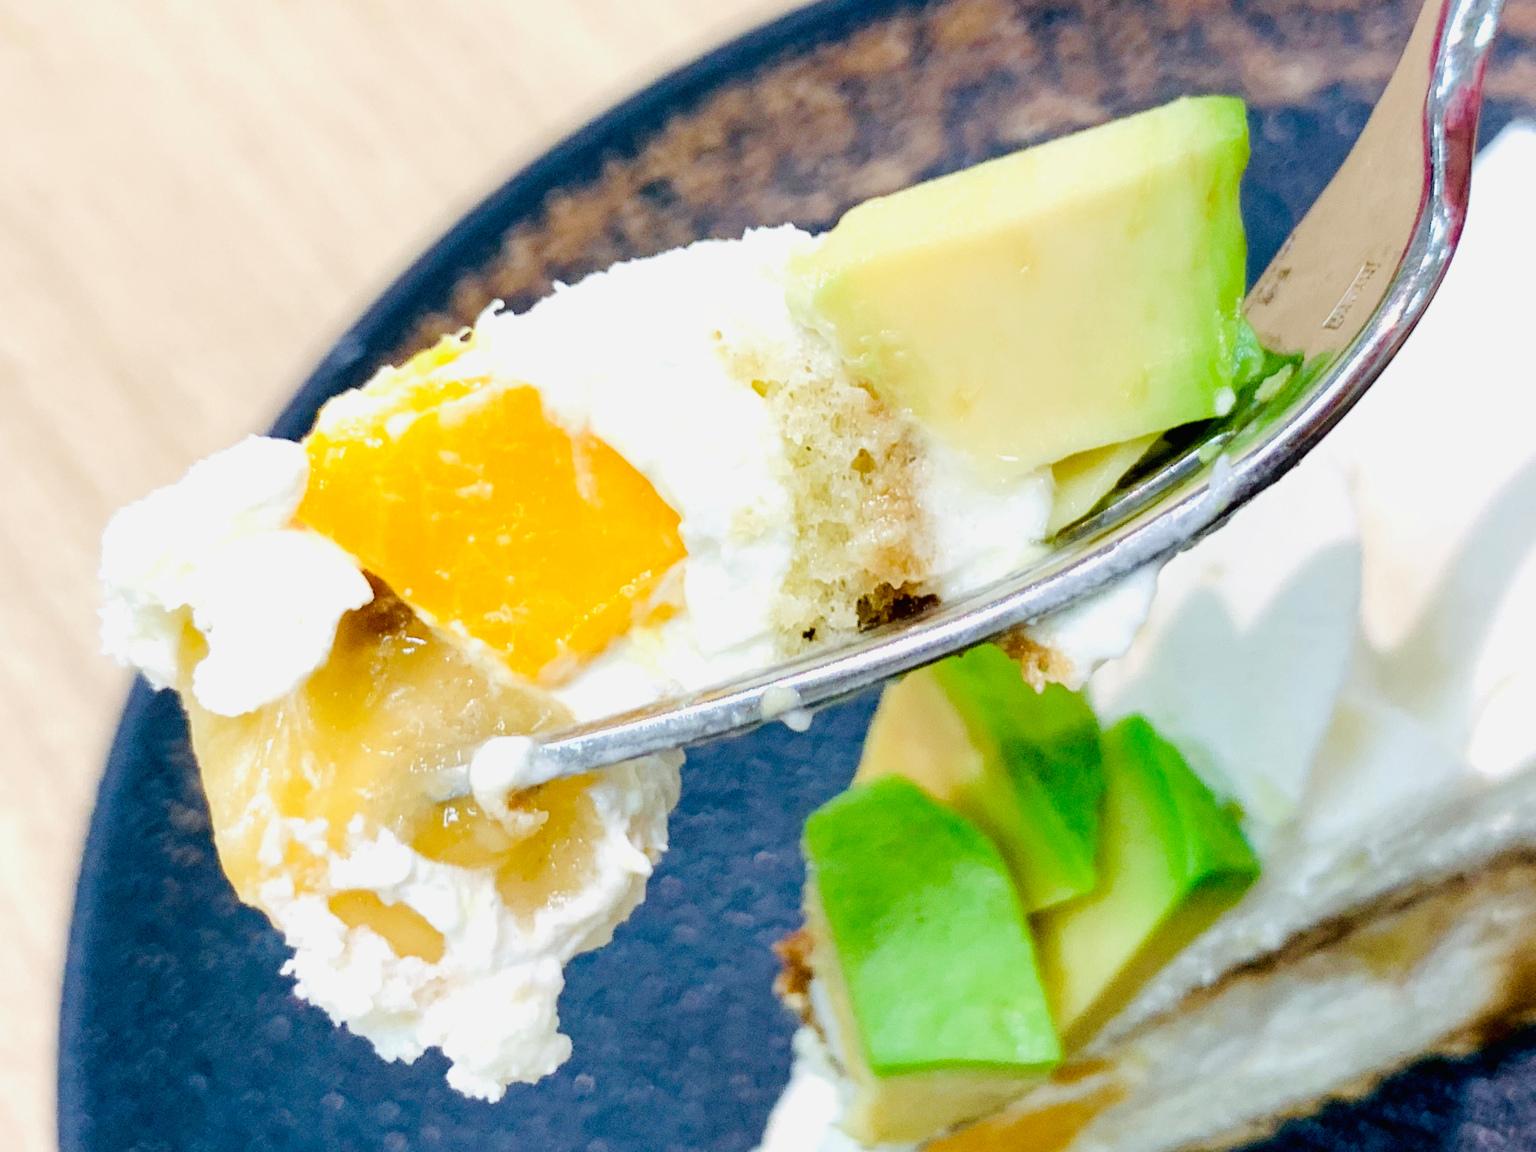 Avocado-tiramisu-cake-comme-ca-Japanese-sweets-Tokyo-cafe-food-desserts-Japan-review-photos-4.jpg